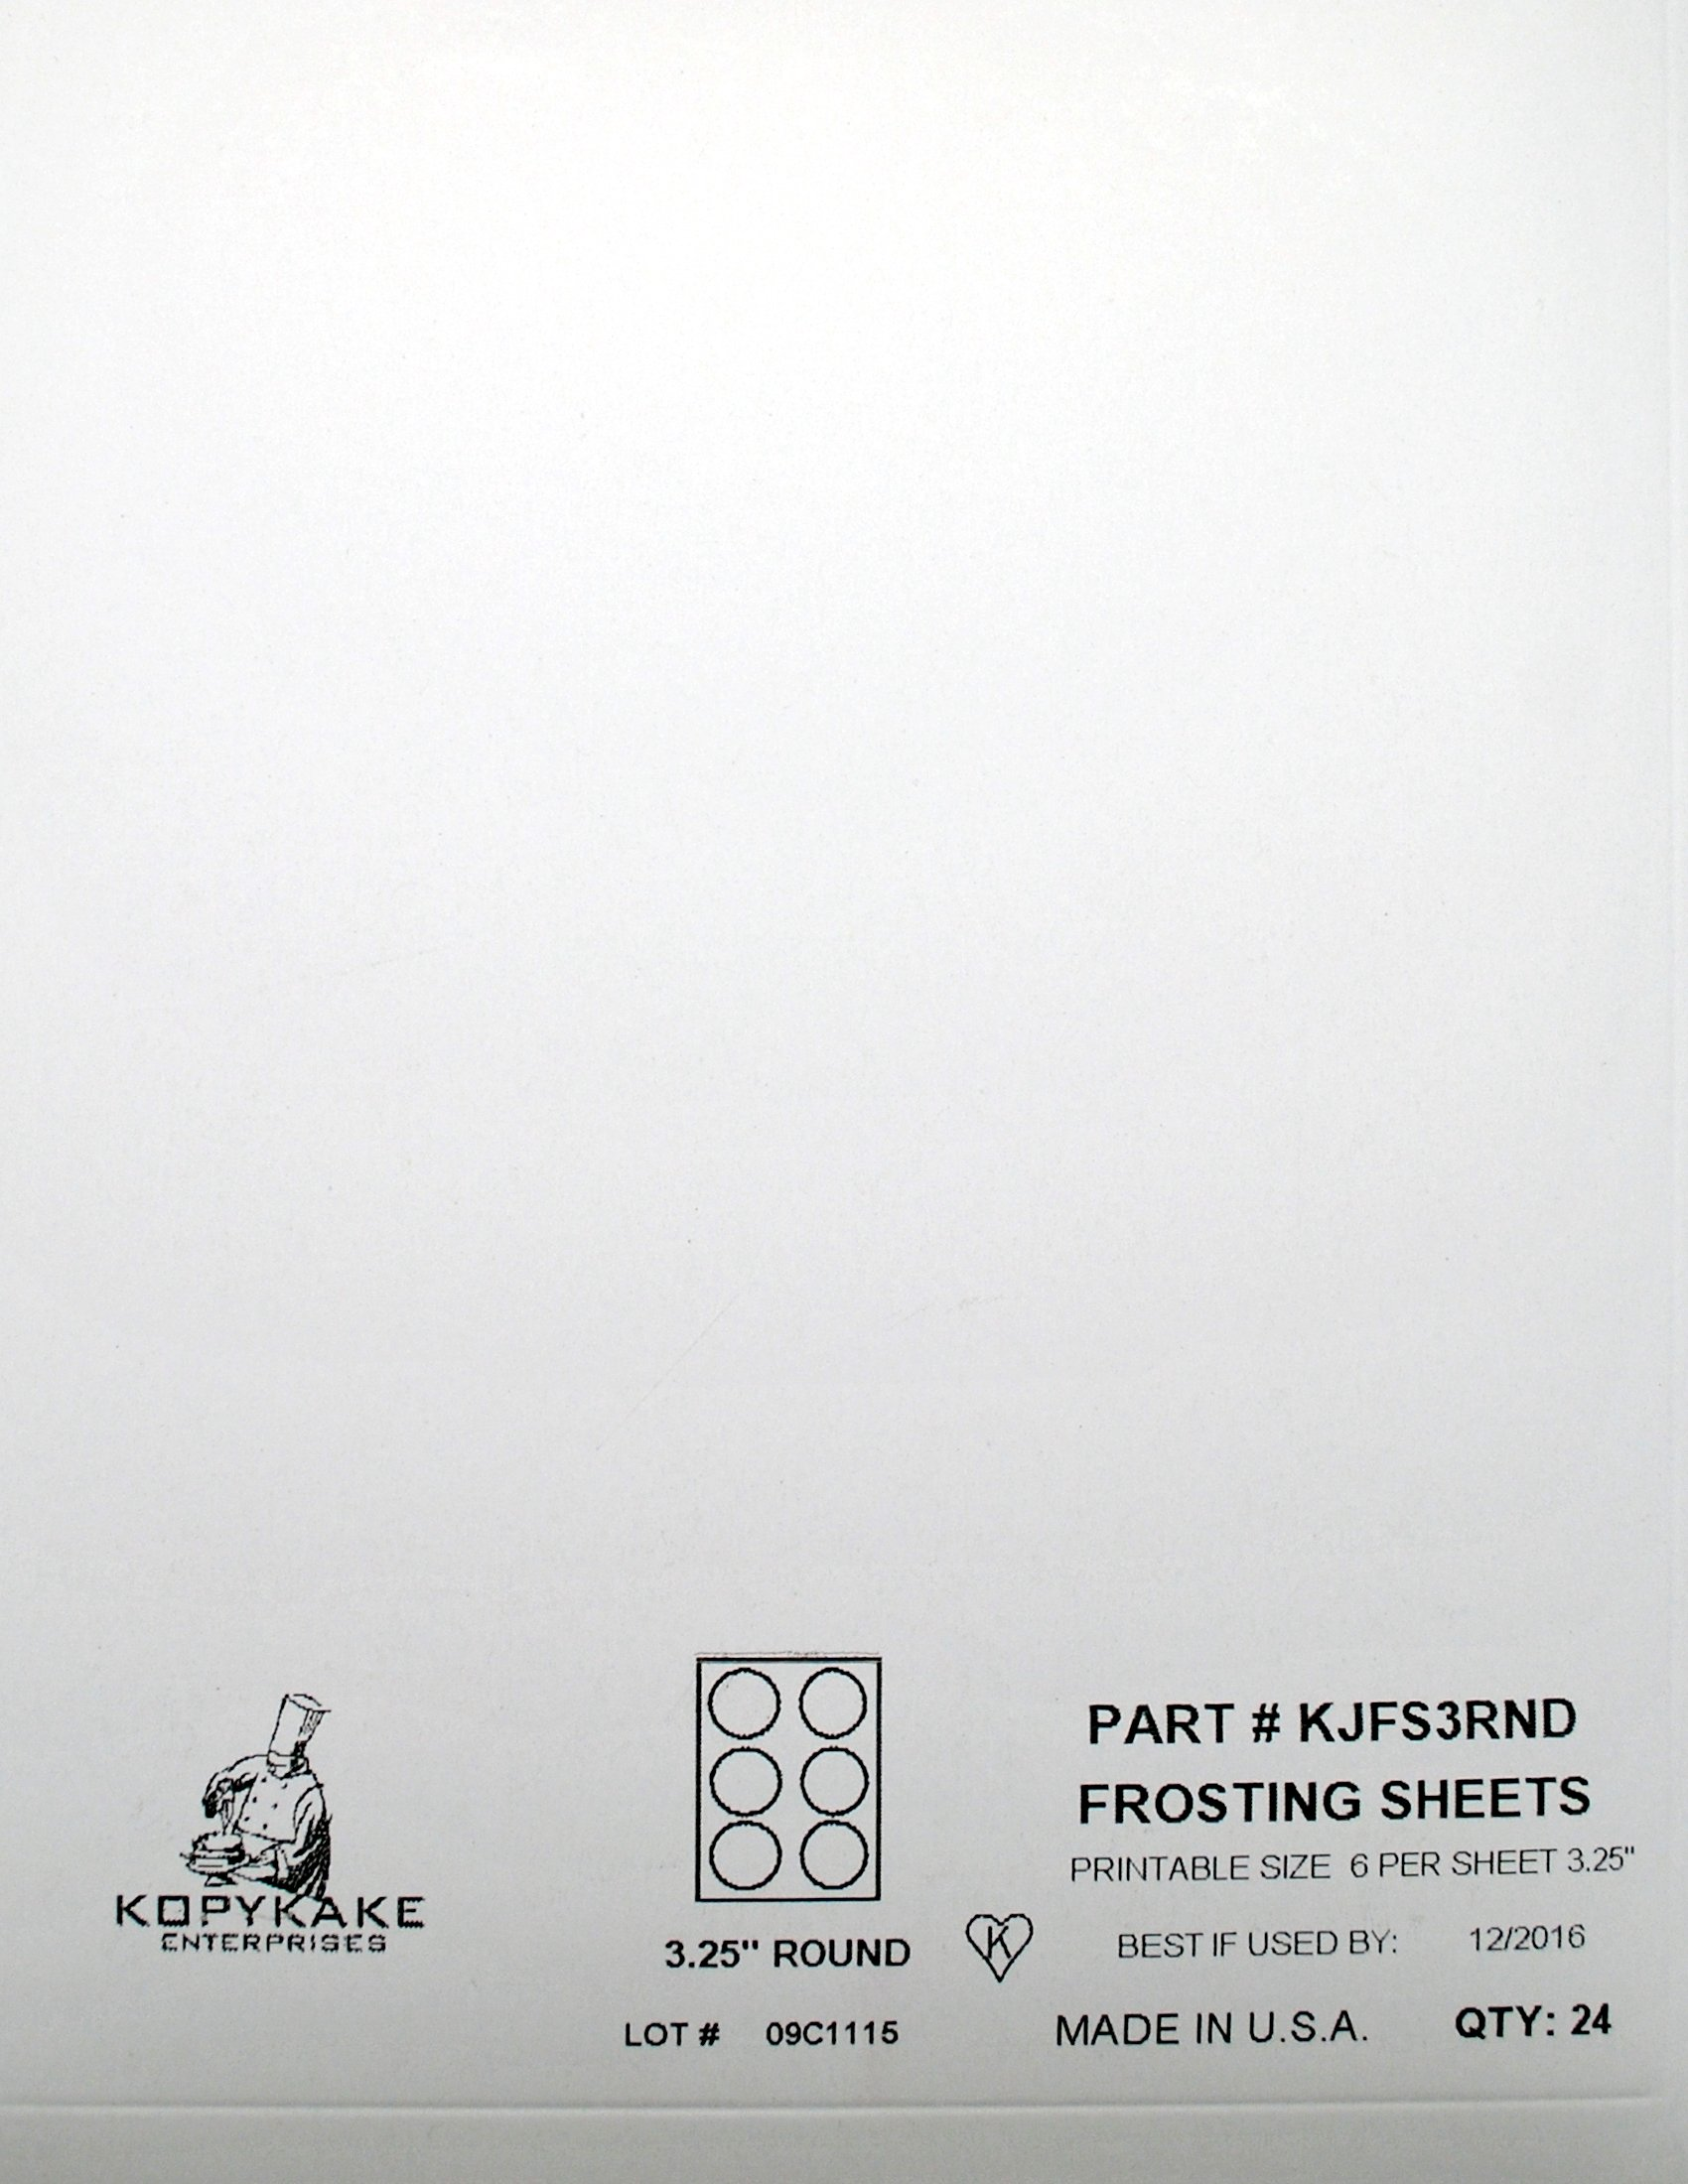 Kopykake KJFS3RND 3'' Circle Frosting Sheets (24 sheets per pack/ 3'' print area) by Kopykake (Image #1)